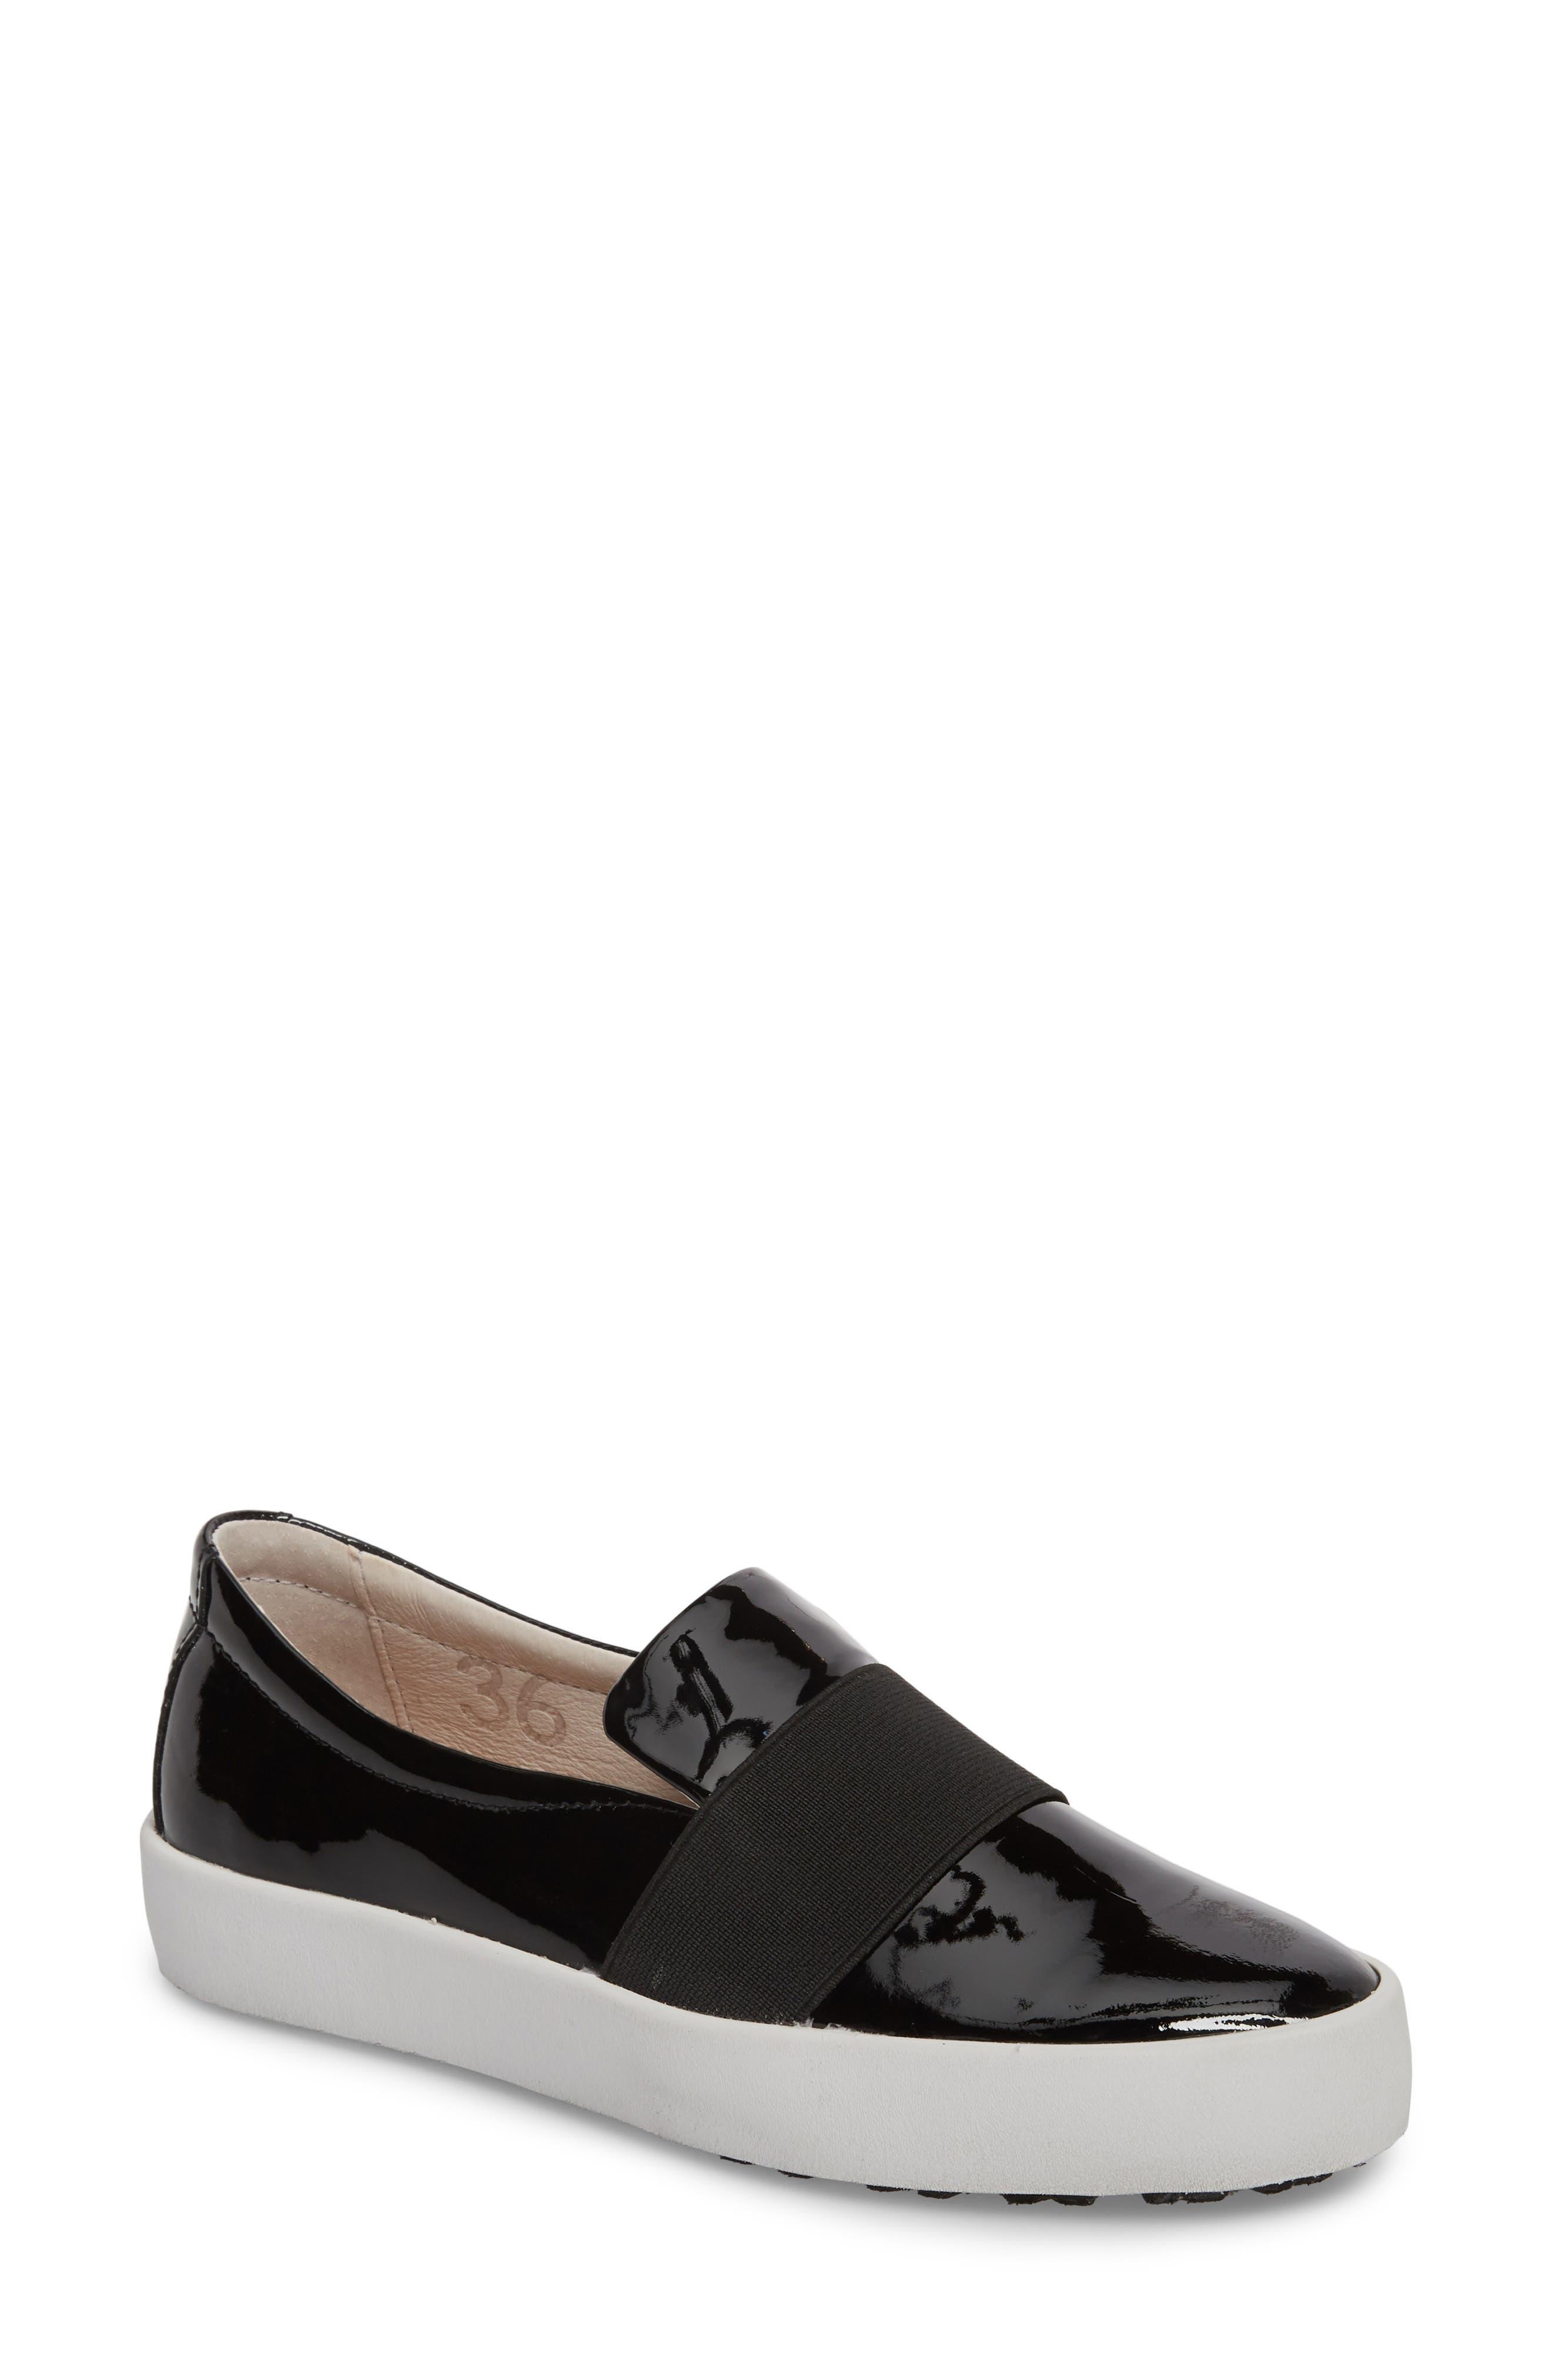 Blackstone Pl99 Slip-On Sneaker Black